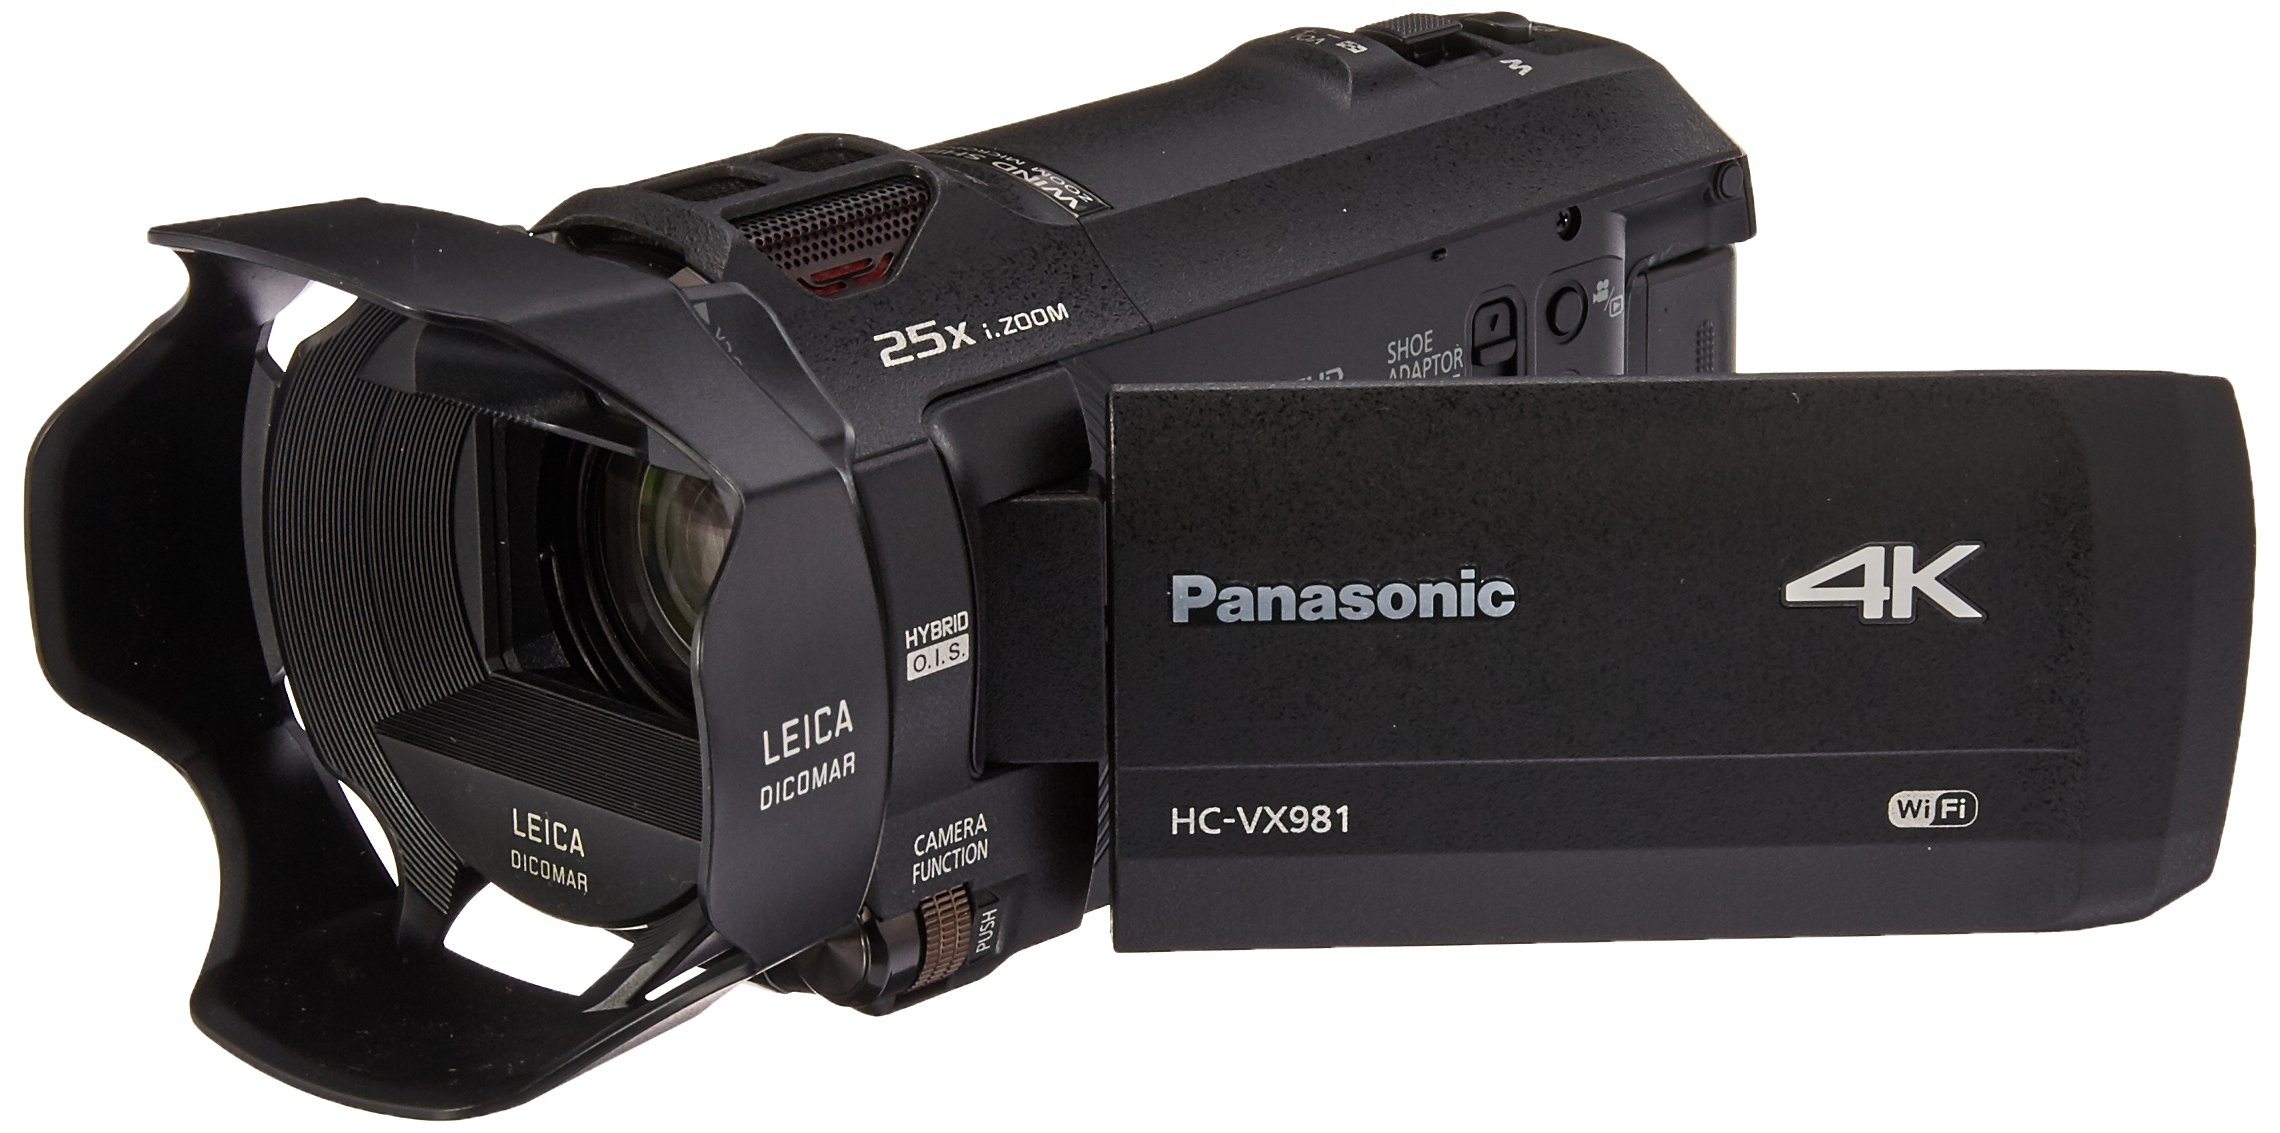 Panasonic 4K Ultra HD Video Camera Camcorder HC-VX981K, 20X Optical Zoom, 1/2.3-Inch BSI Sensor, HDR Capture, Wi-Fi…